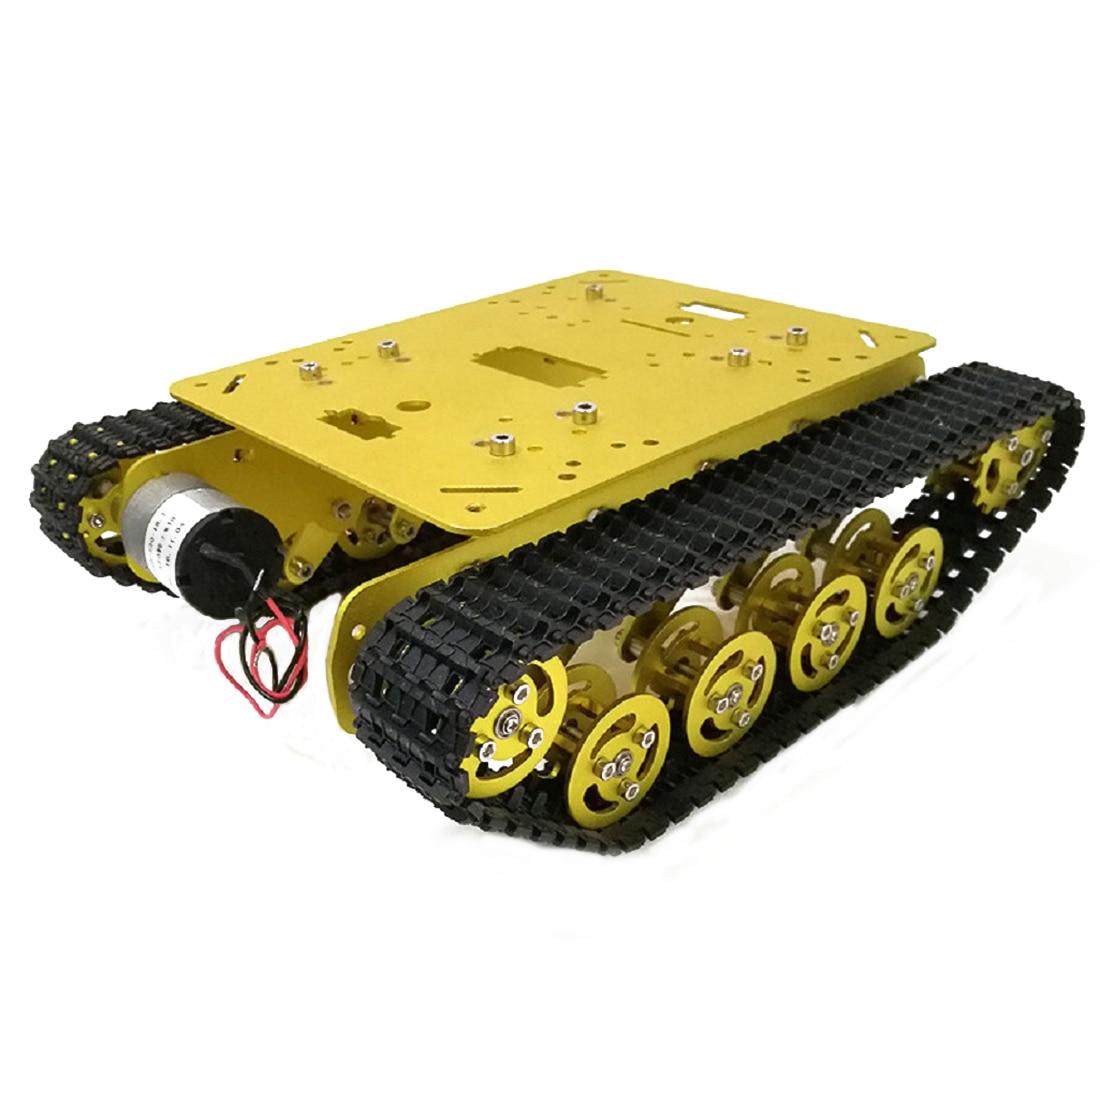 Rowsfire 1Set 12V Arduino DIY Tracked Robot Smart Car Metal Tank Chassis Kit - Golden/Black